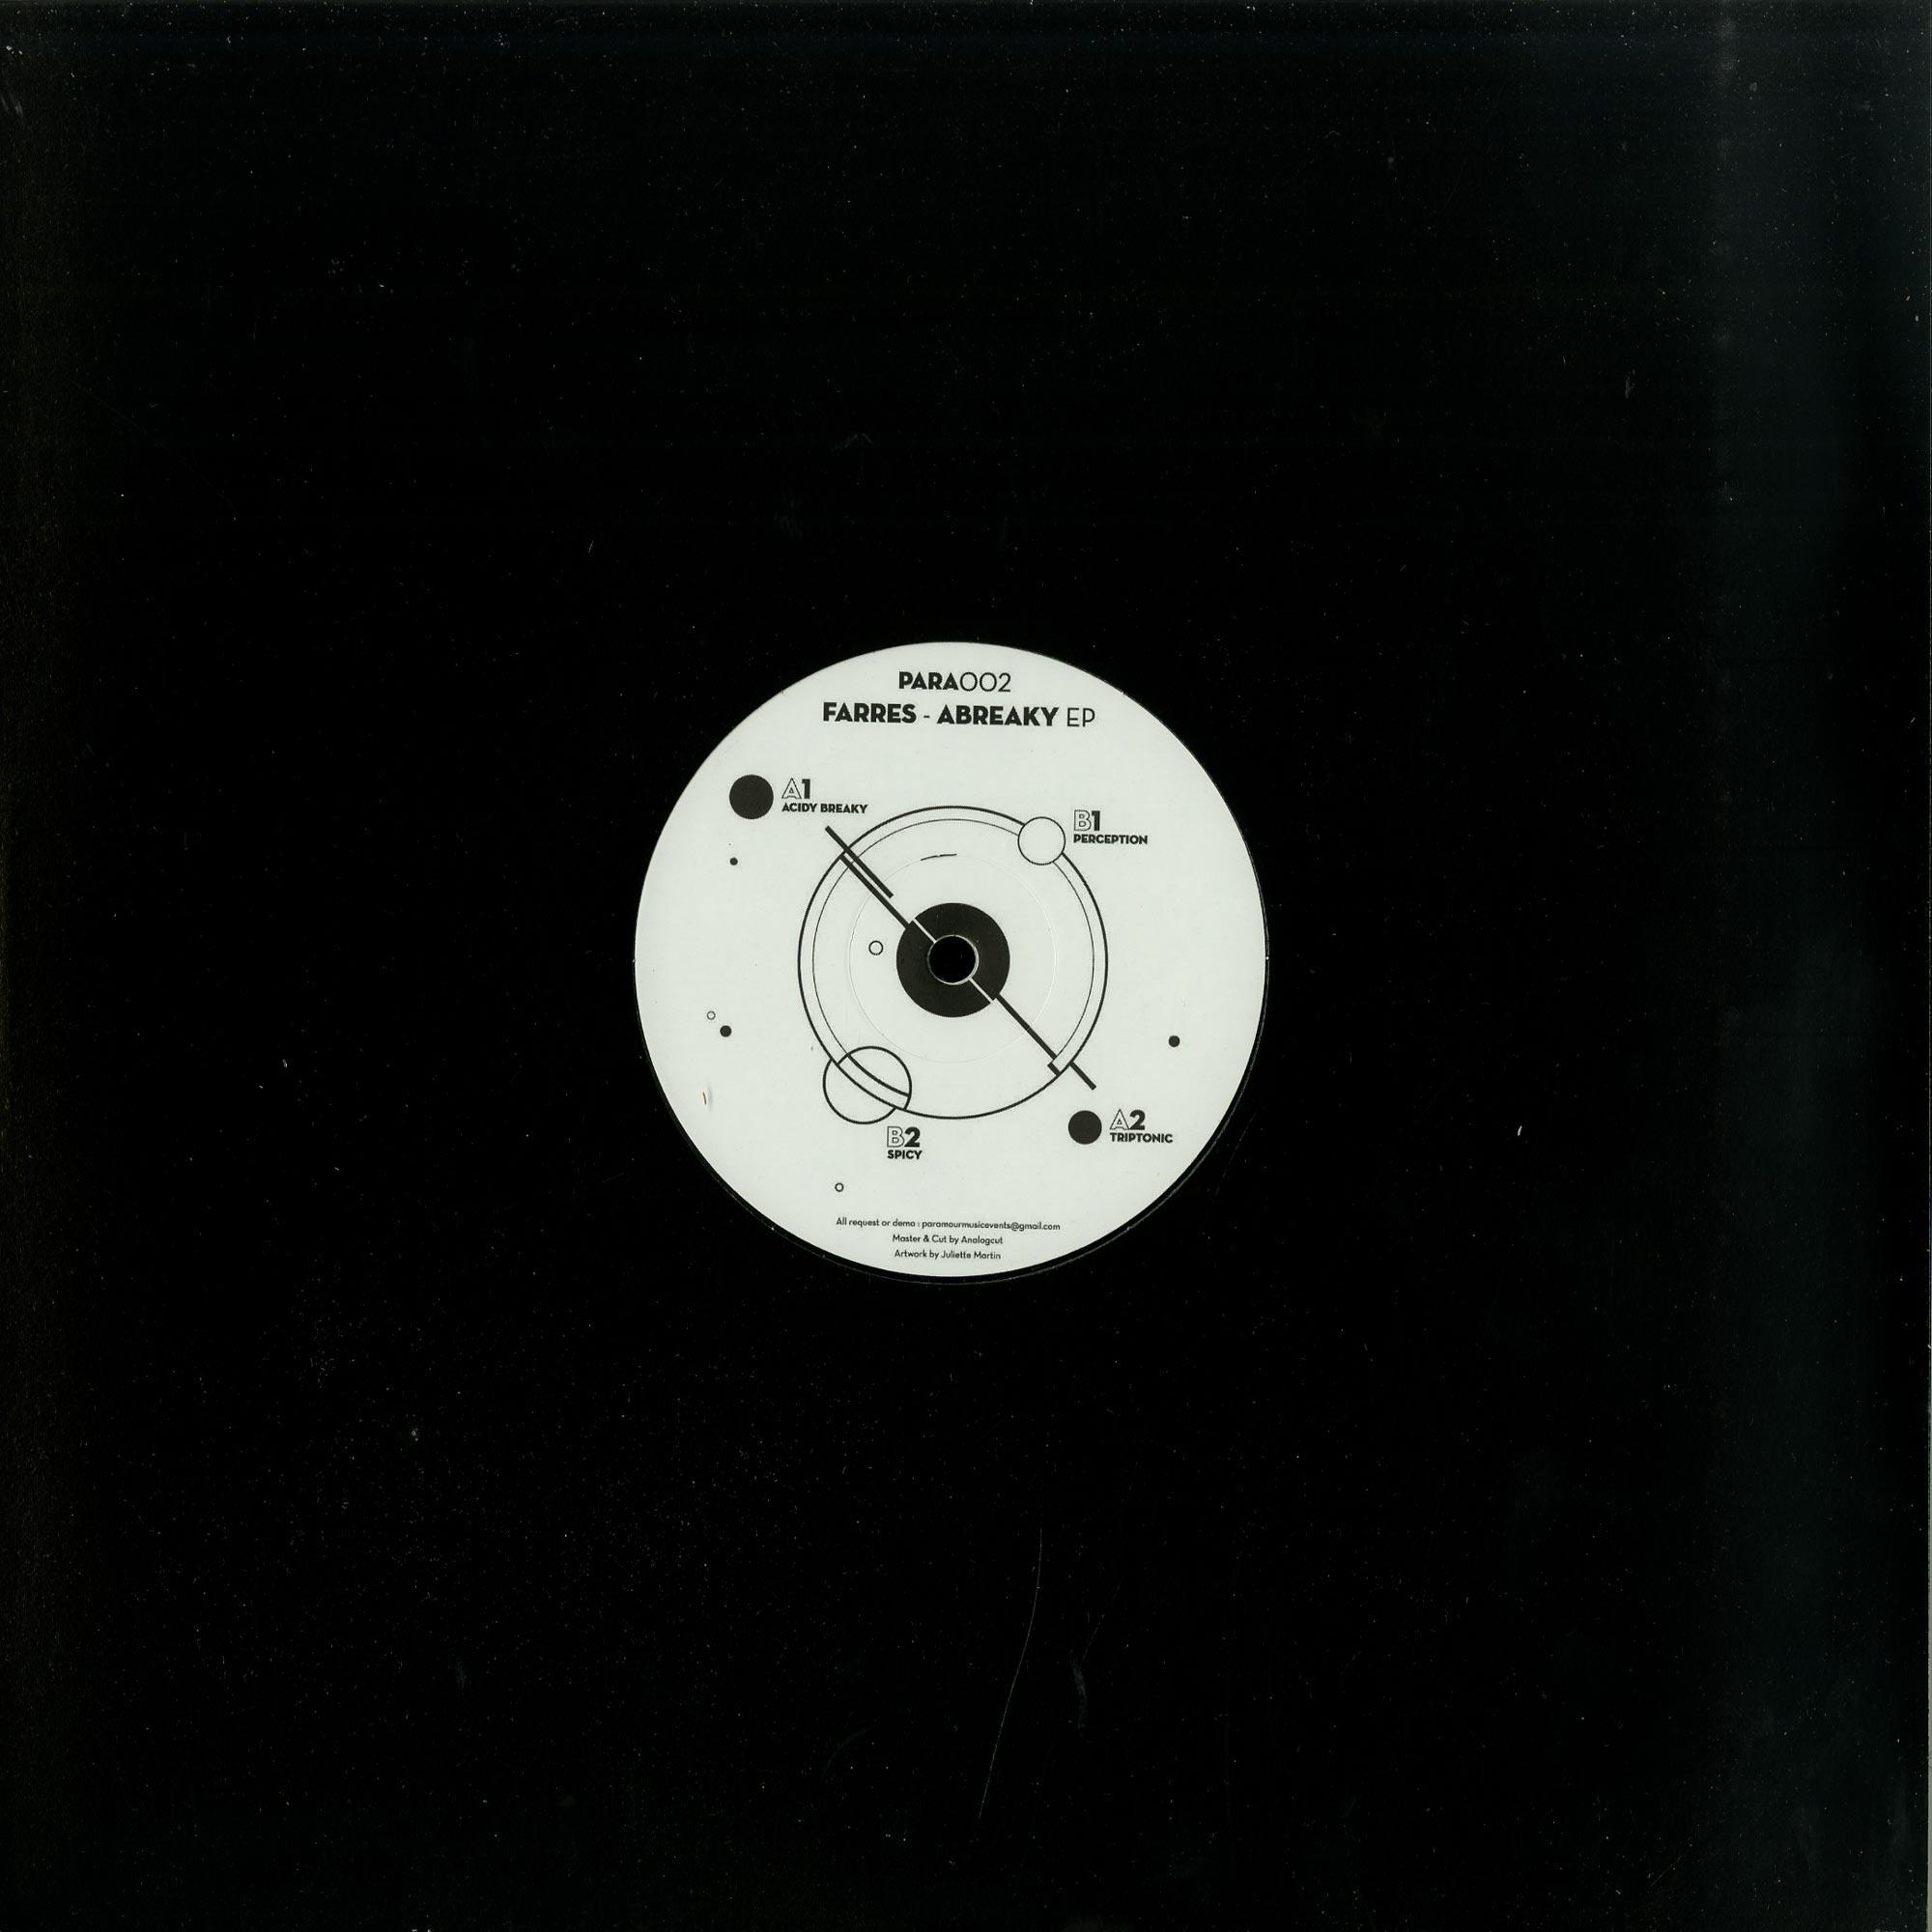 Farres - ABREAKY EP